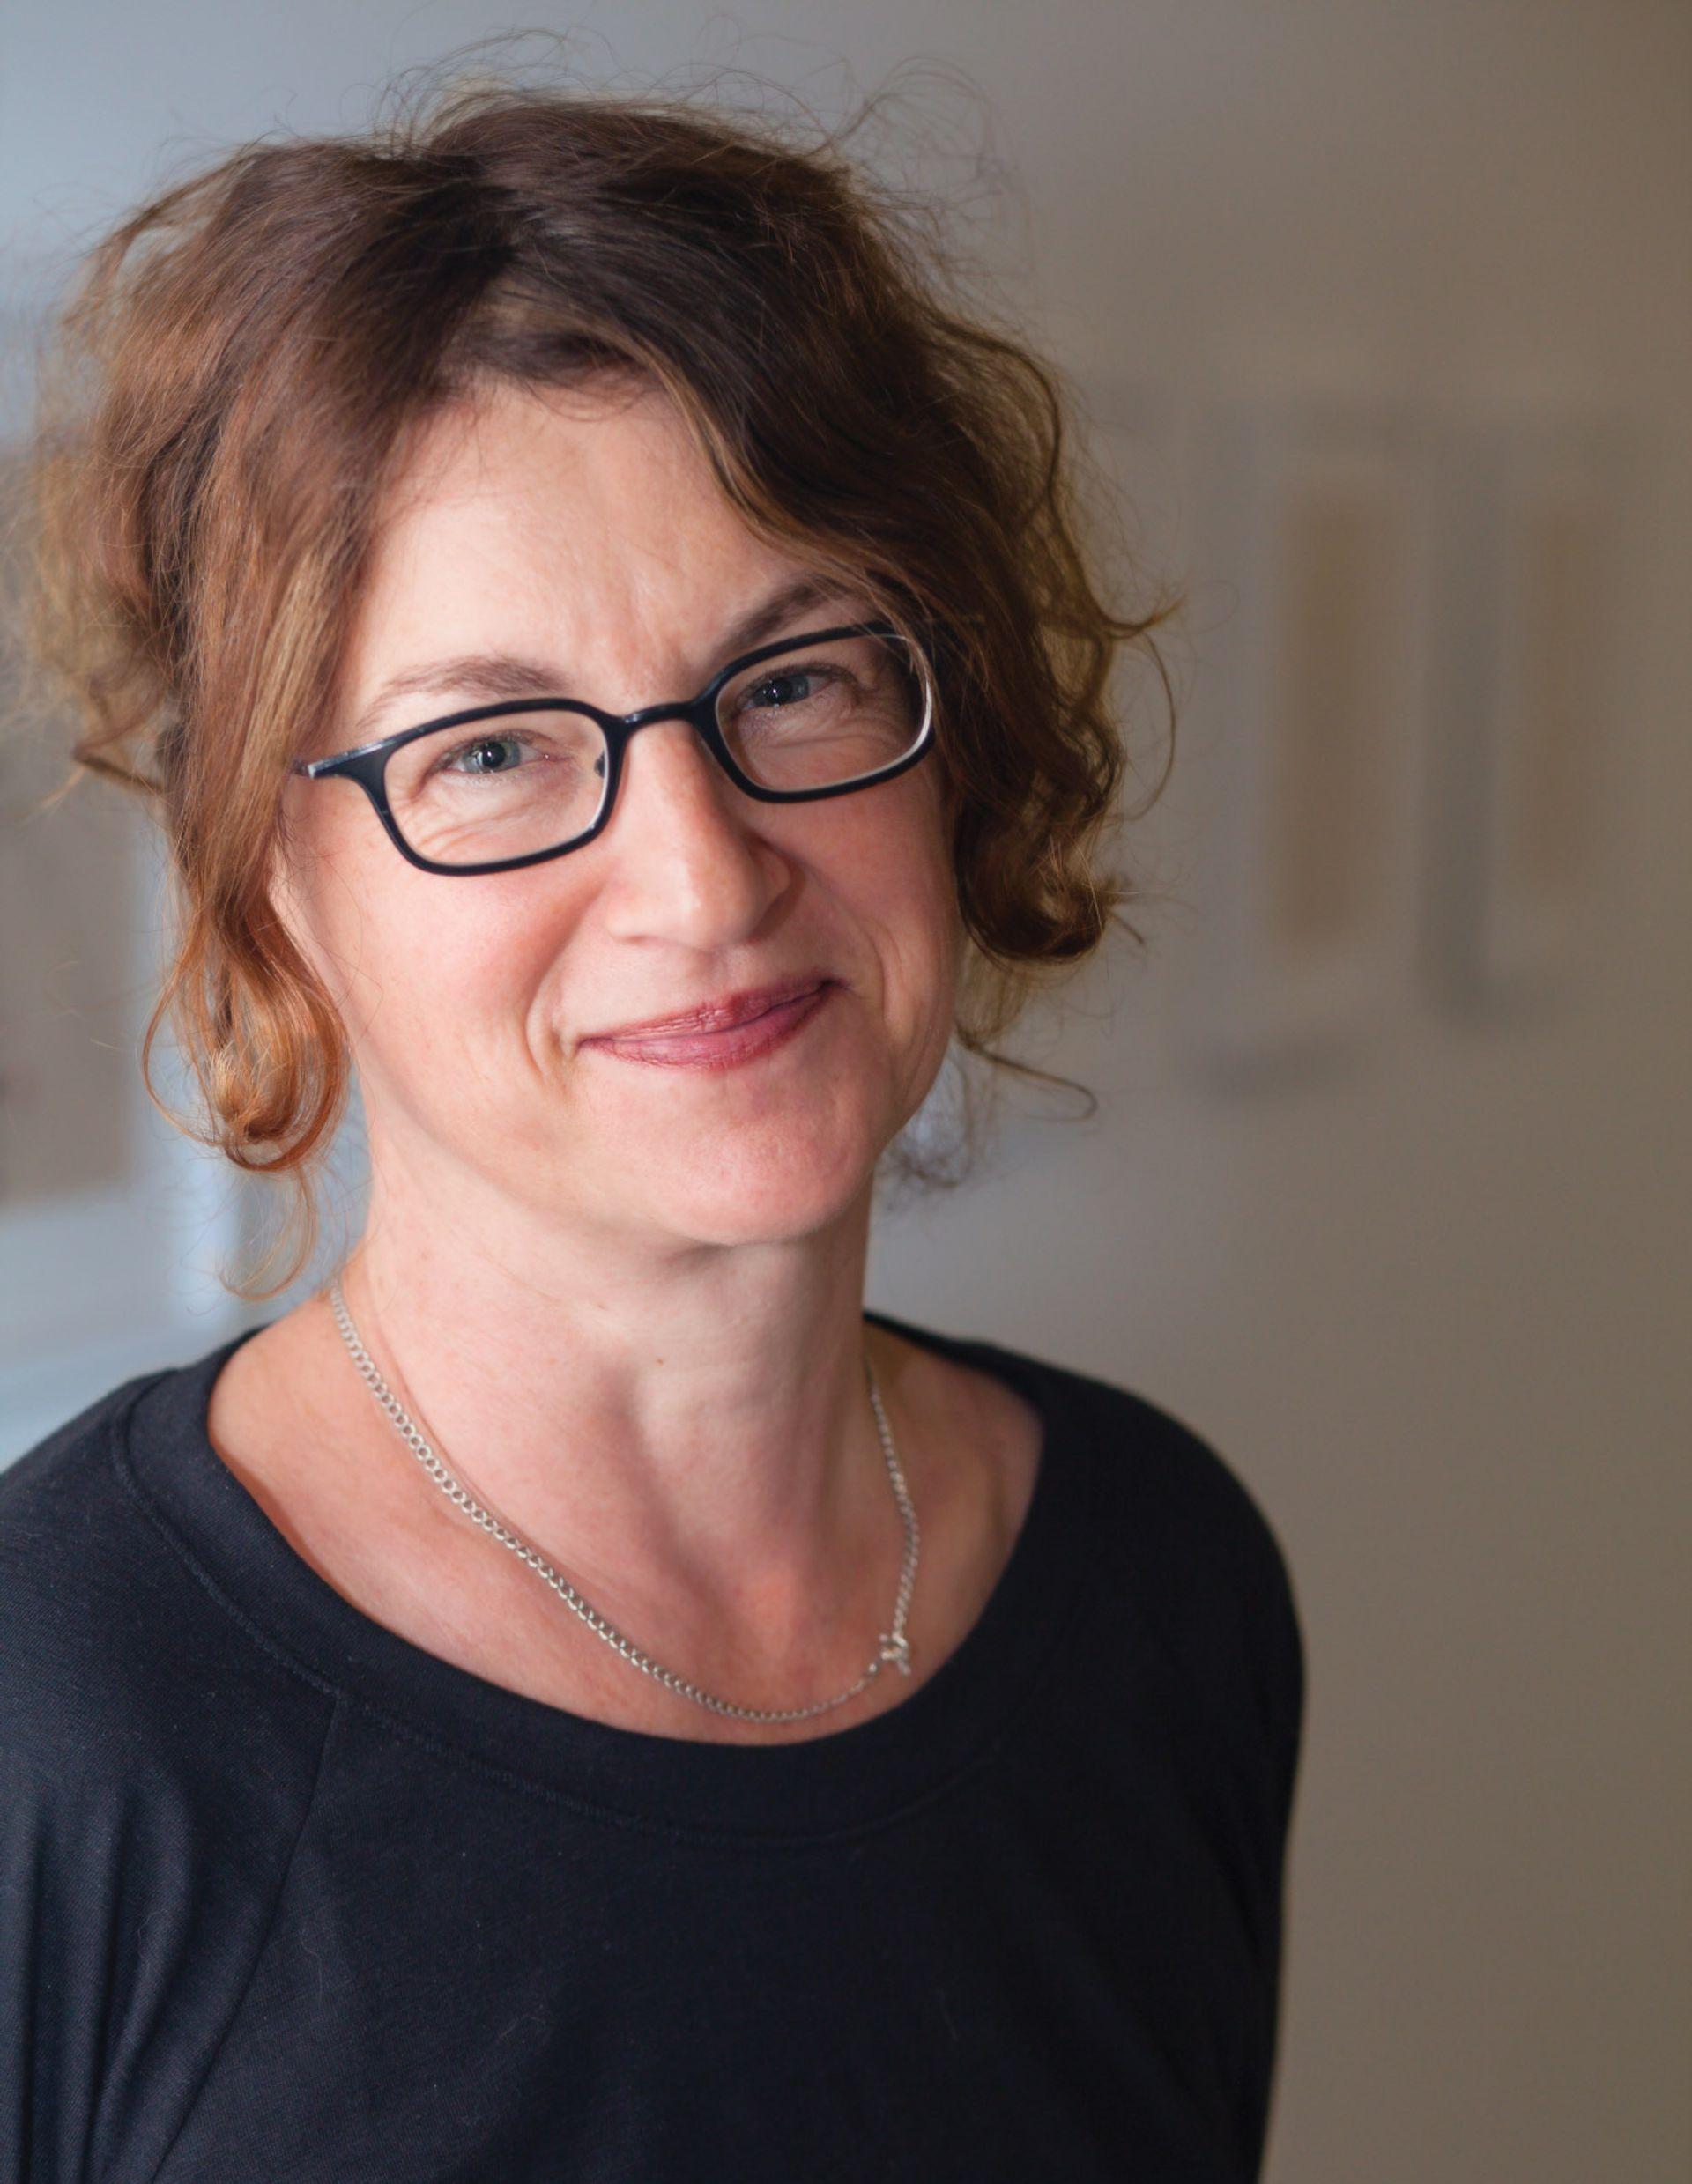 Susanne Vielmetter © Carolyn Barnes Photography